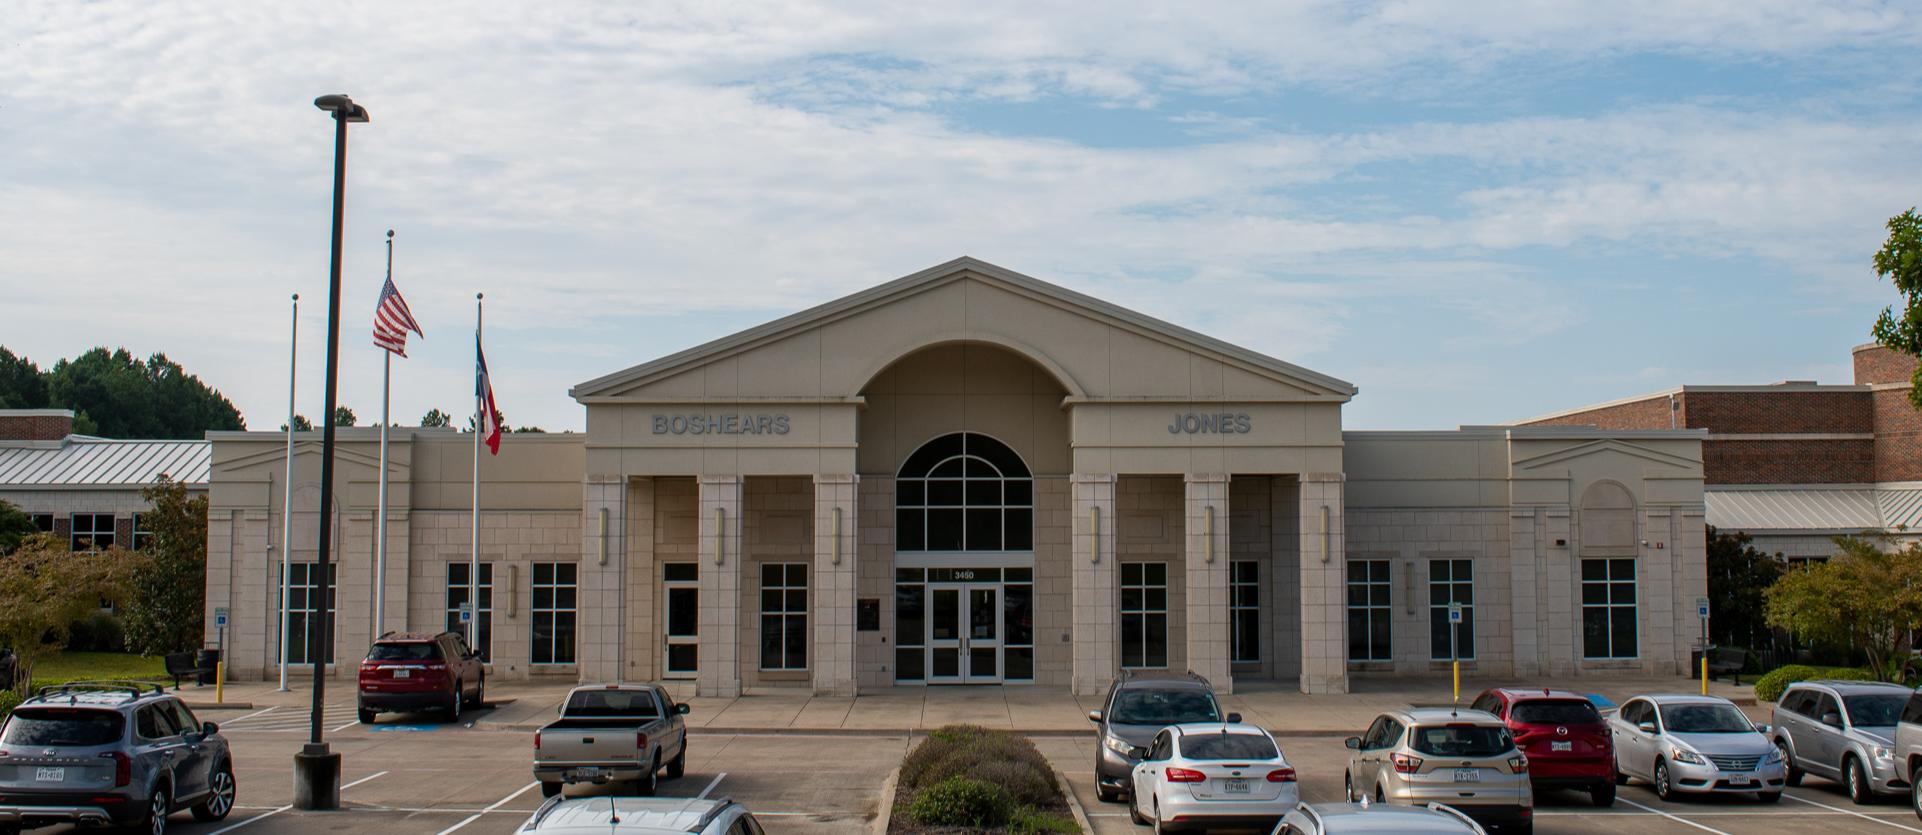 Boshears school front